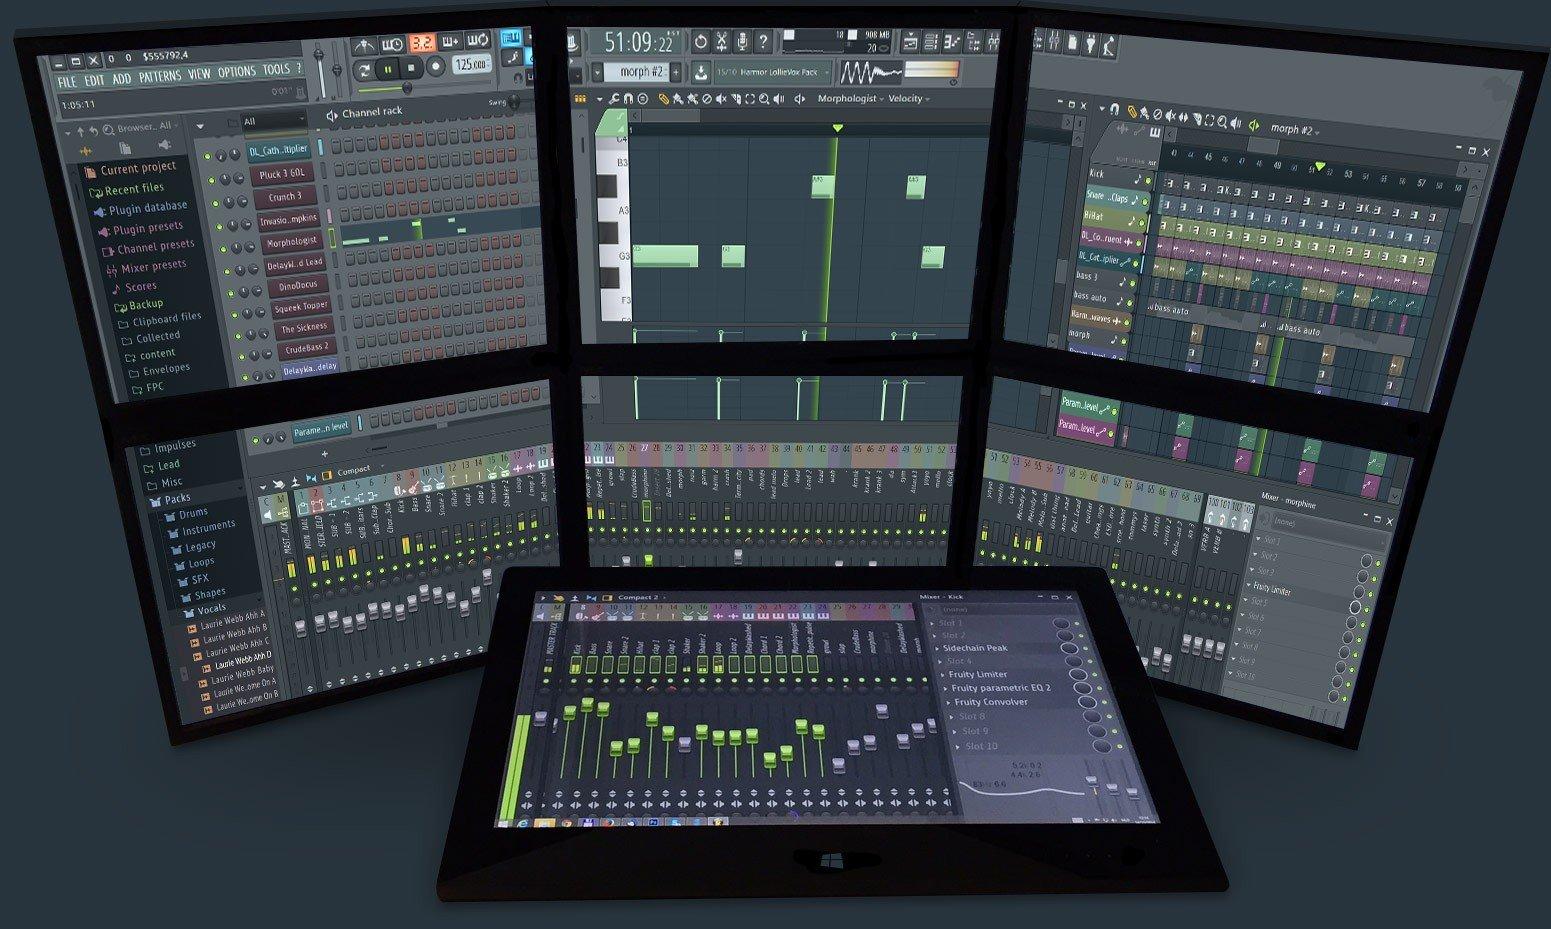 Fl Studio Cracked Apk Download For Pc